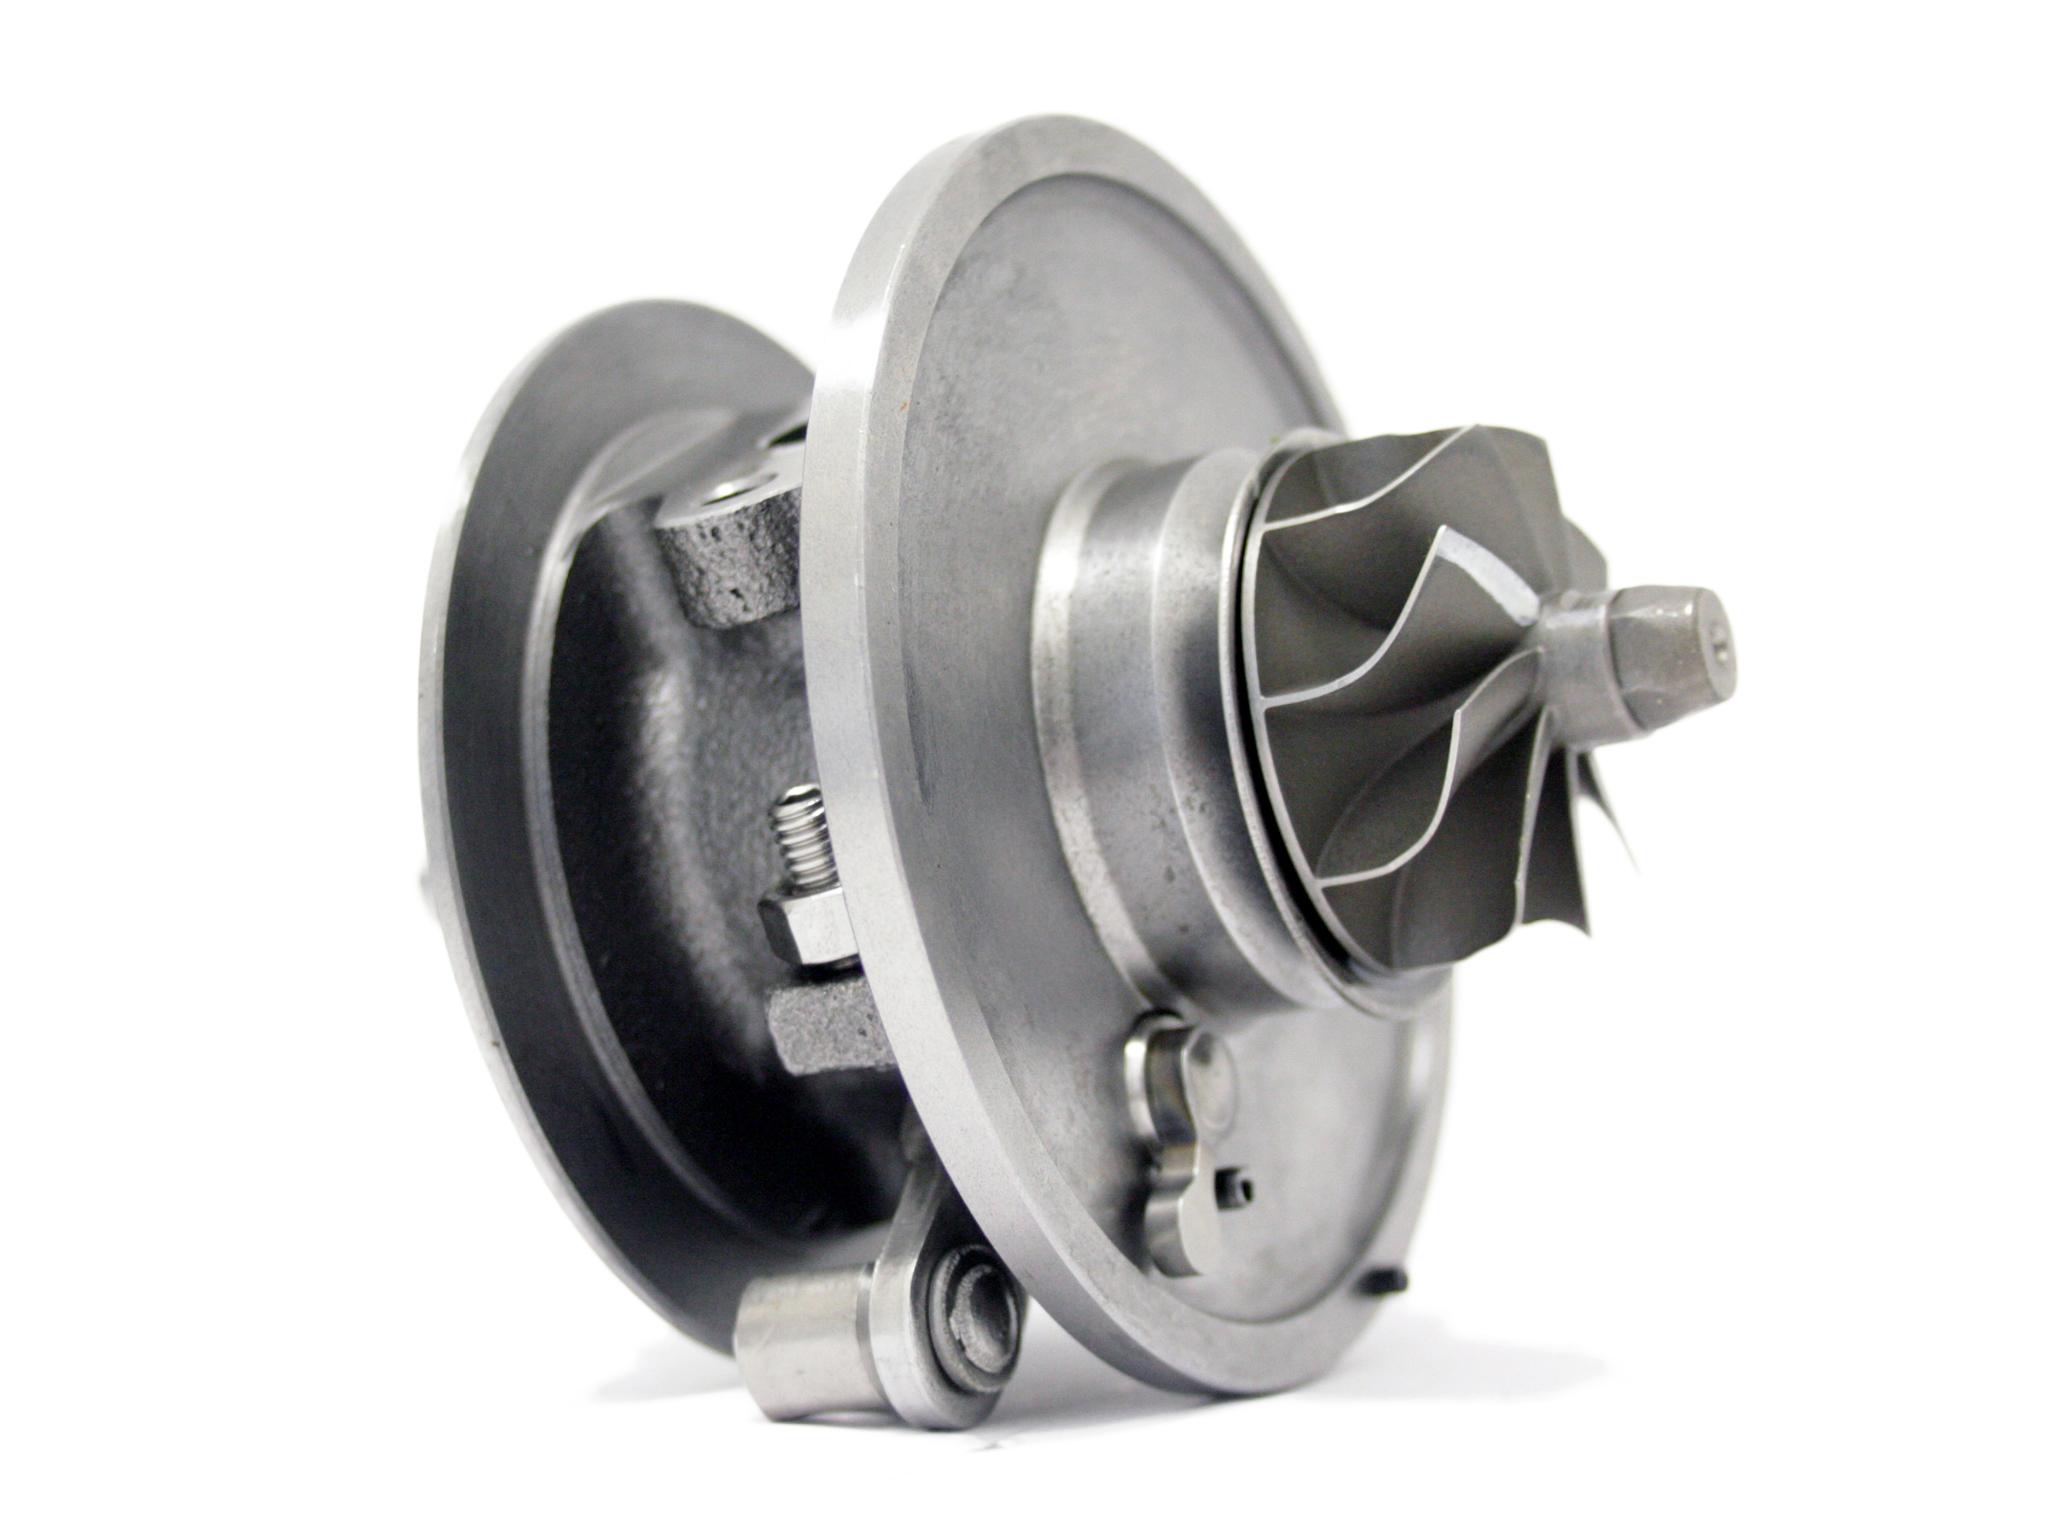 Картридж турбины BV39, KP39 Фольксваген 1.9 TDI 86-115 л.с.